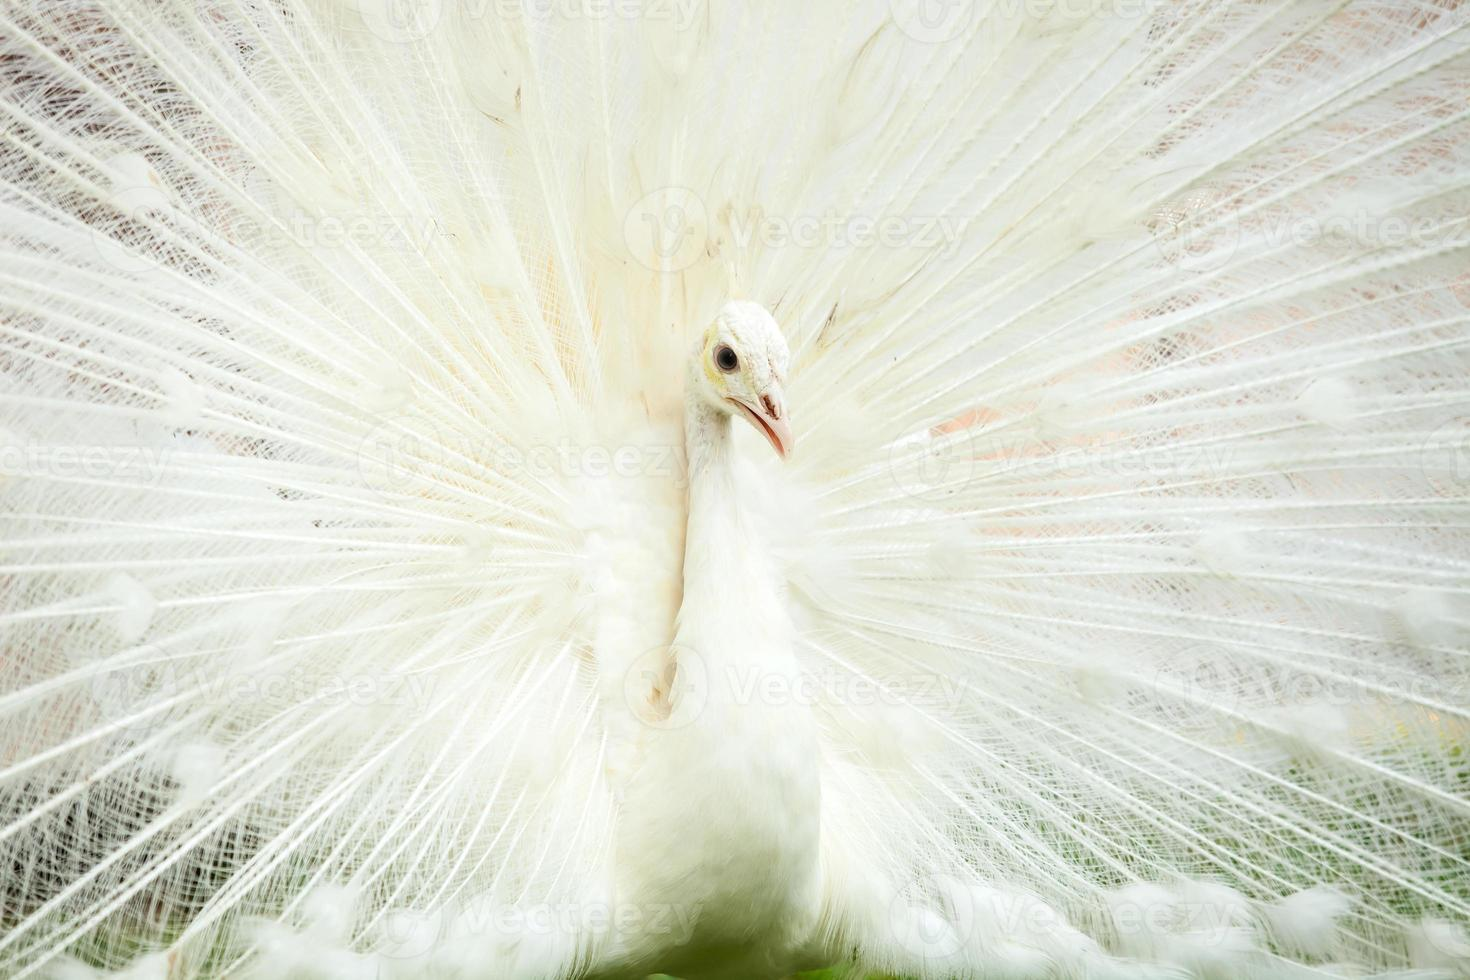 pavo real blanco foto